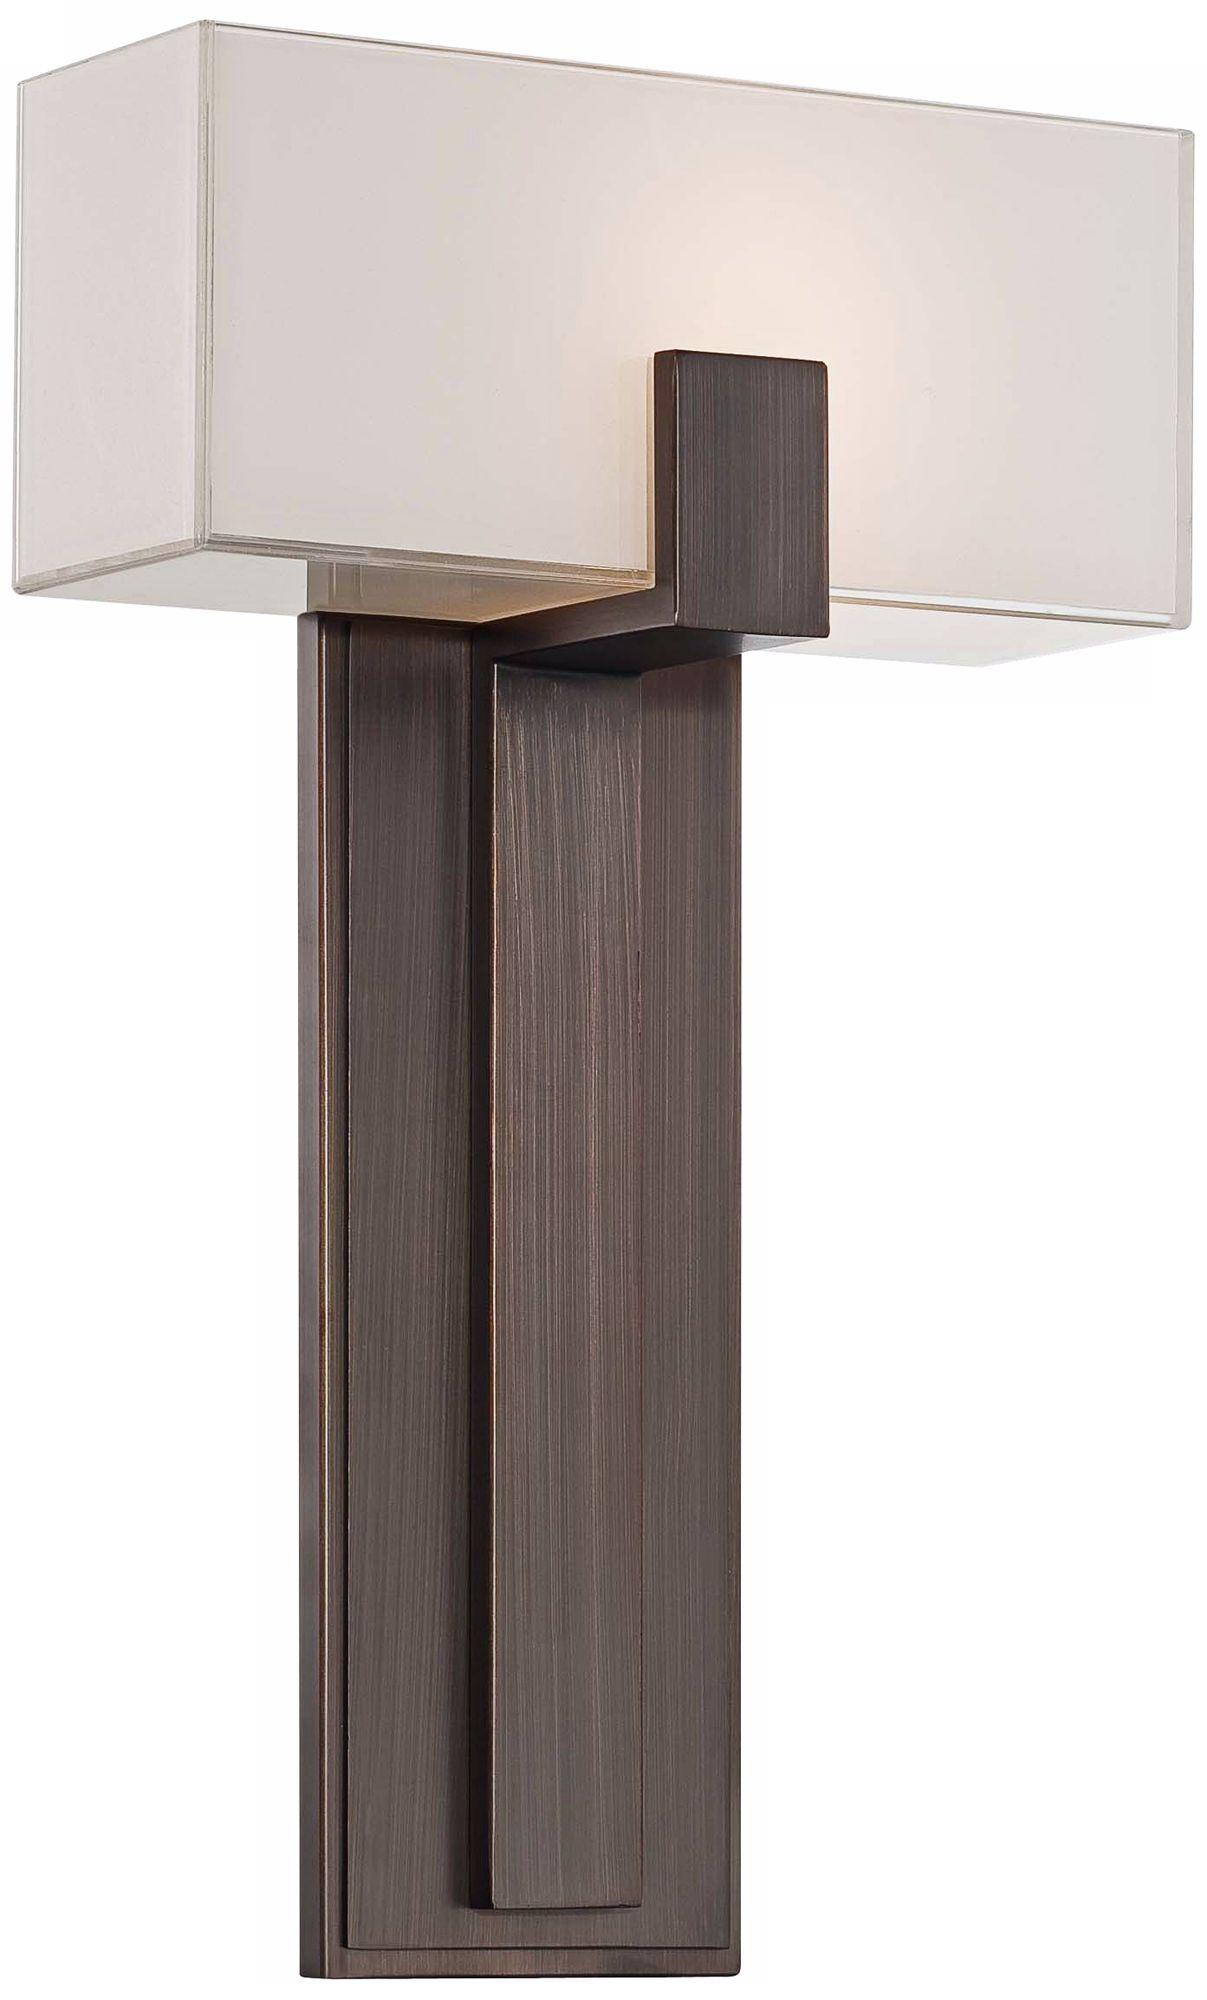 George Kovacs Mitered Glass 10  Copper Bronze Wall Sconce  sc 1 st  L&s Plus & George Kovacs Mitered Glass 10